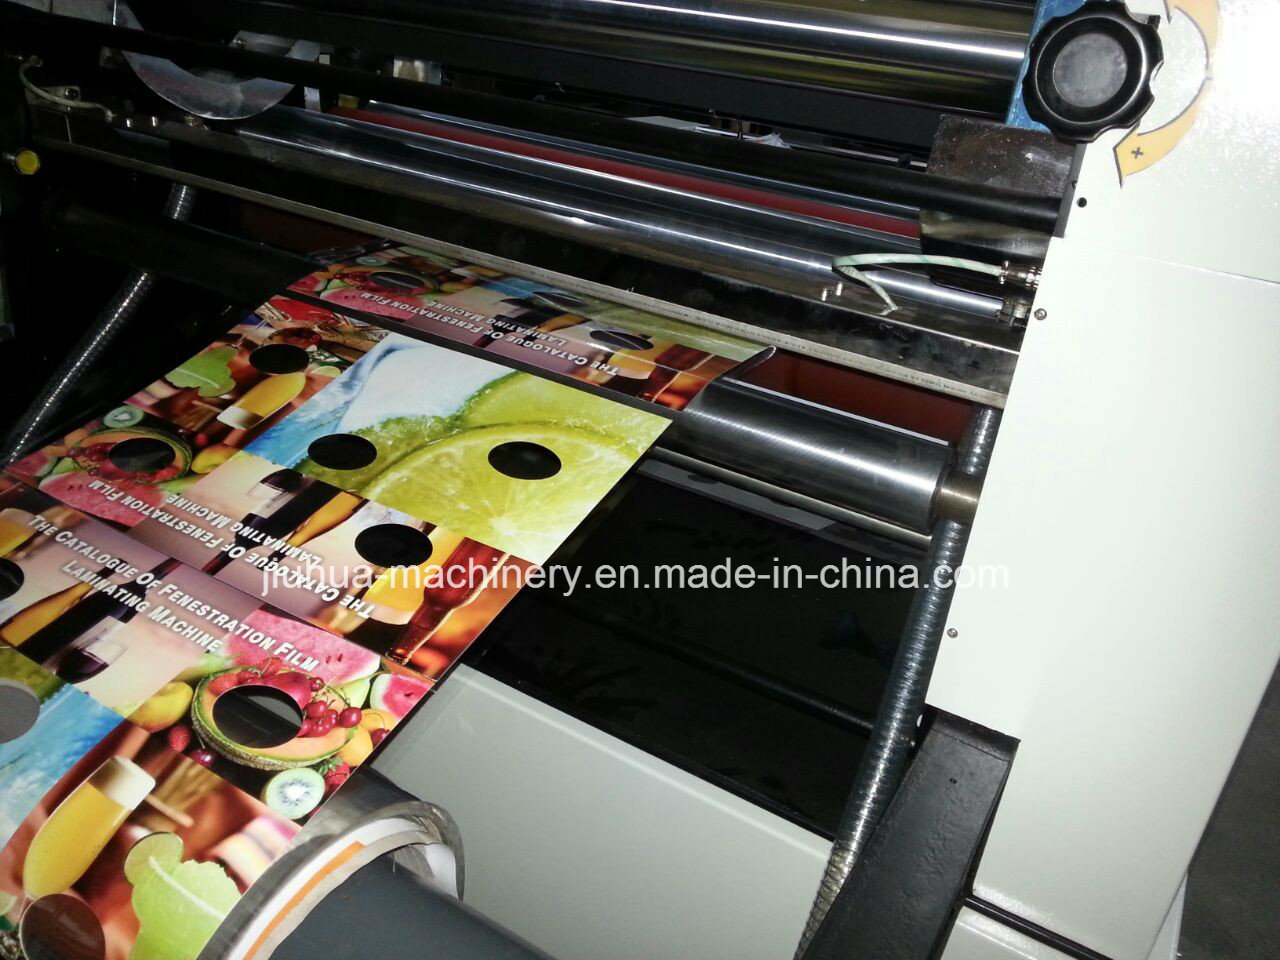 Kfm-1020 Window Manual Water-Based Film Laminating Machine